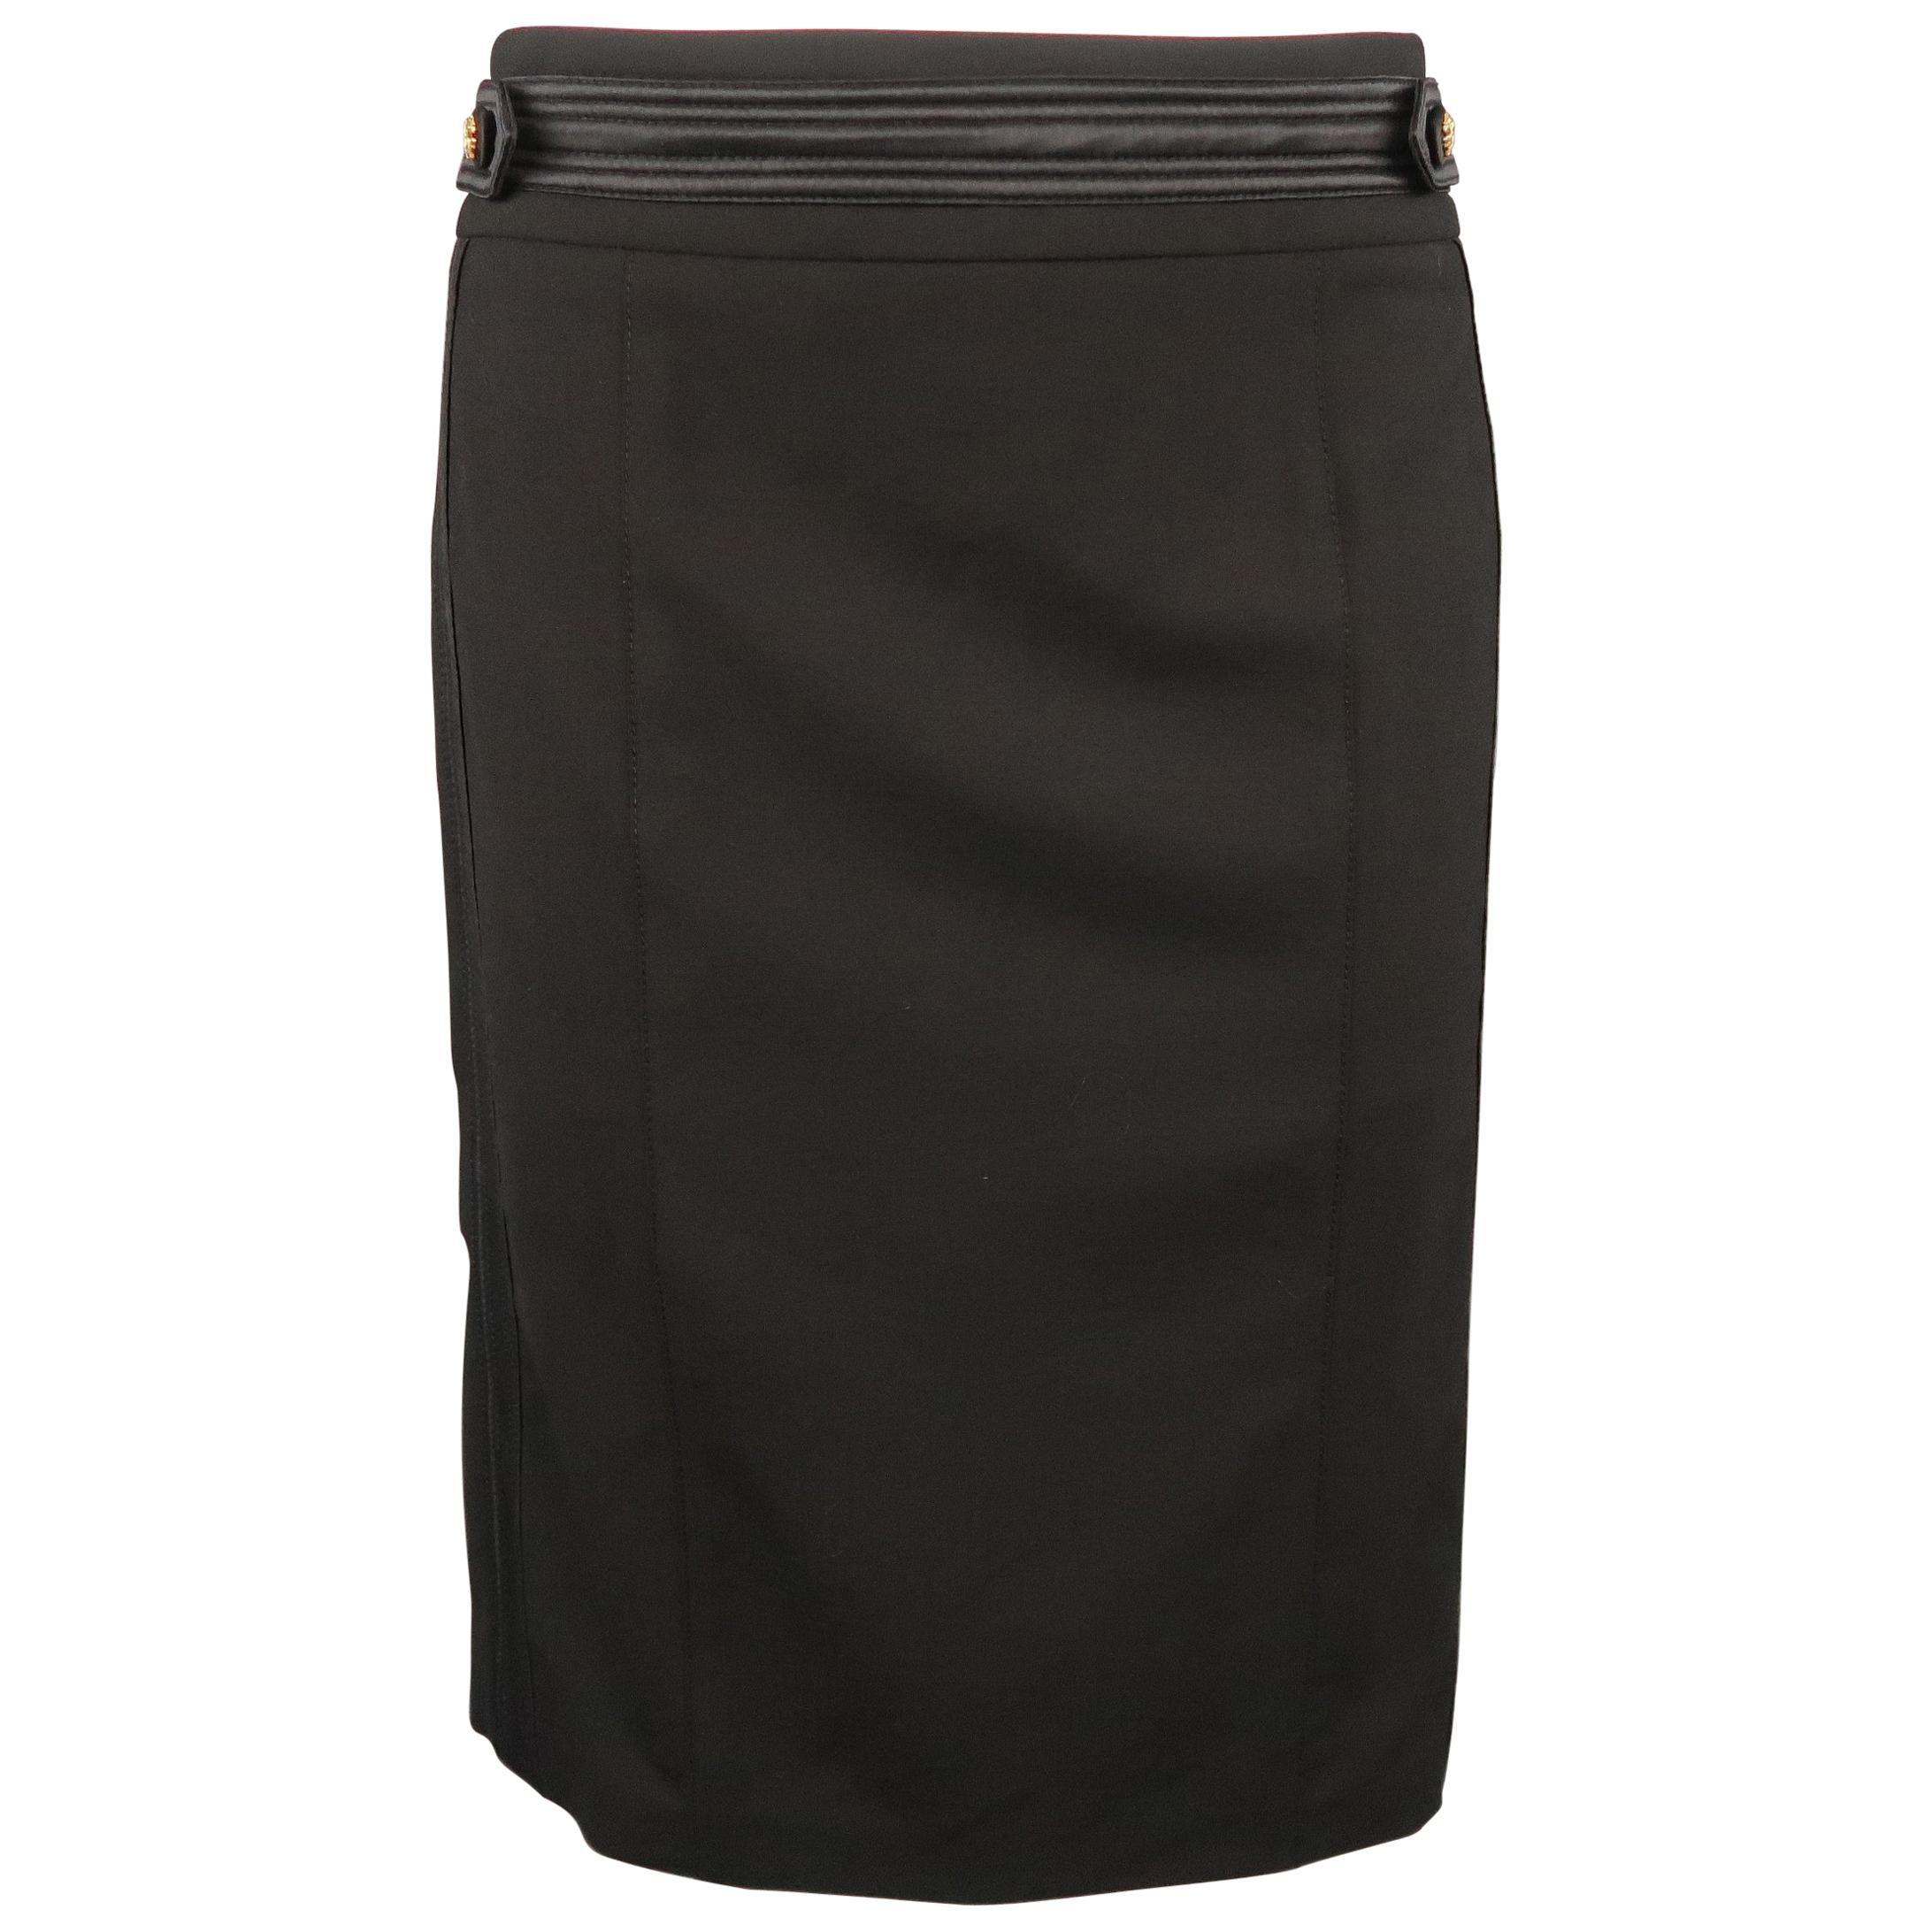 ROBERTO CAVALLI Size 6 Black Satin Trim Gold Button Tab Pencil Skirt